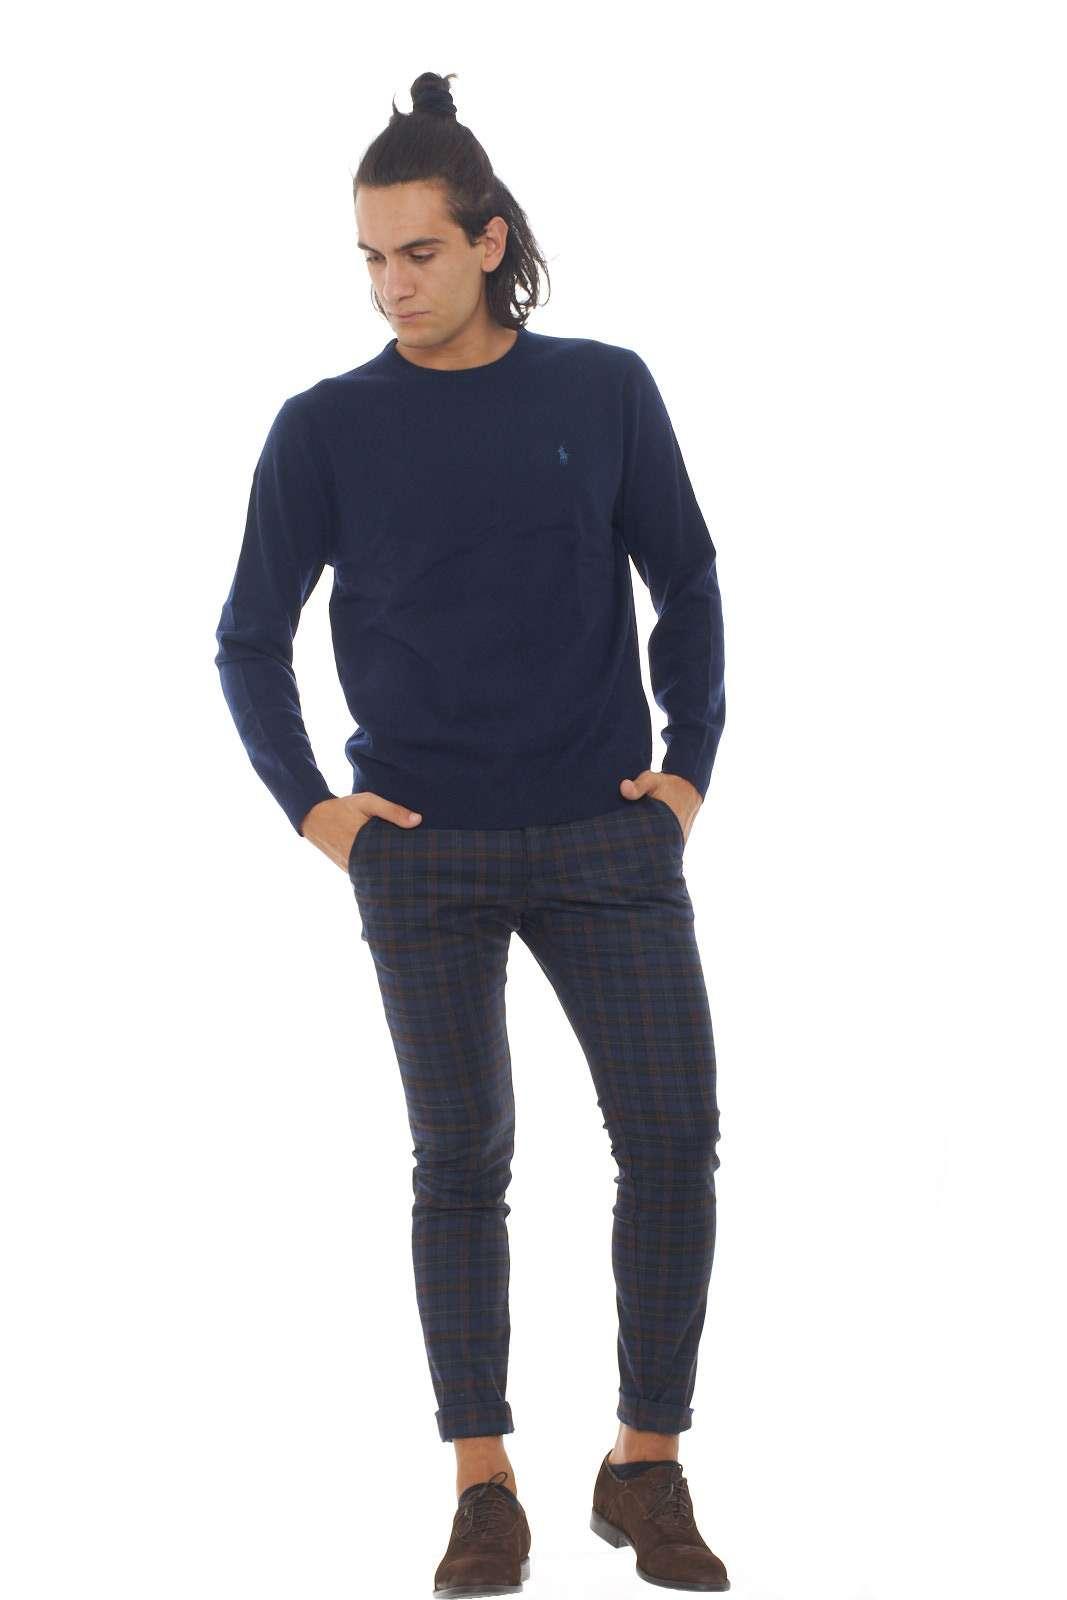 https://www.parmax.com/media/catalog/product/a/i/AI-outlet_parmax-pantaloni-uomo-Desica-SORRENTO%20103-D.jpg